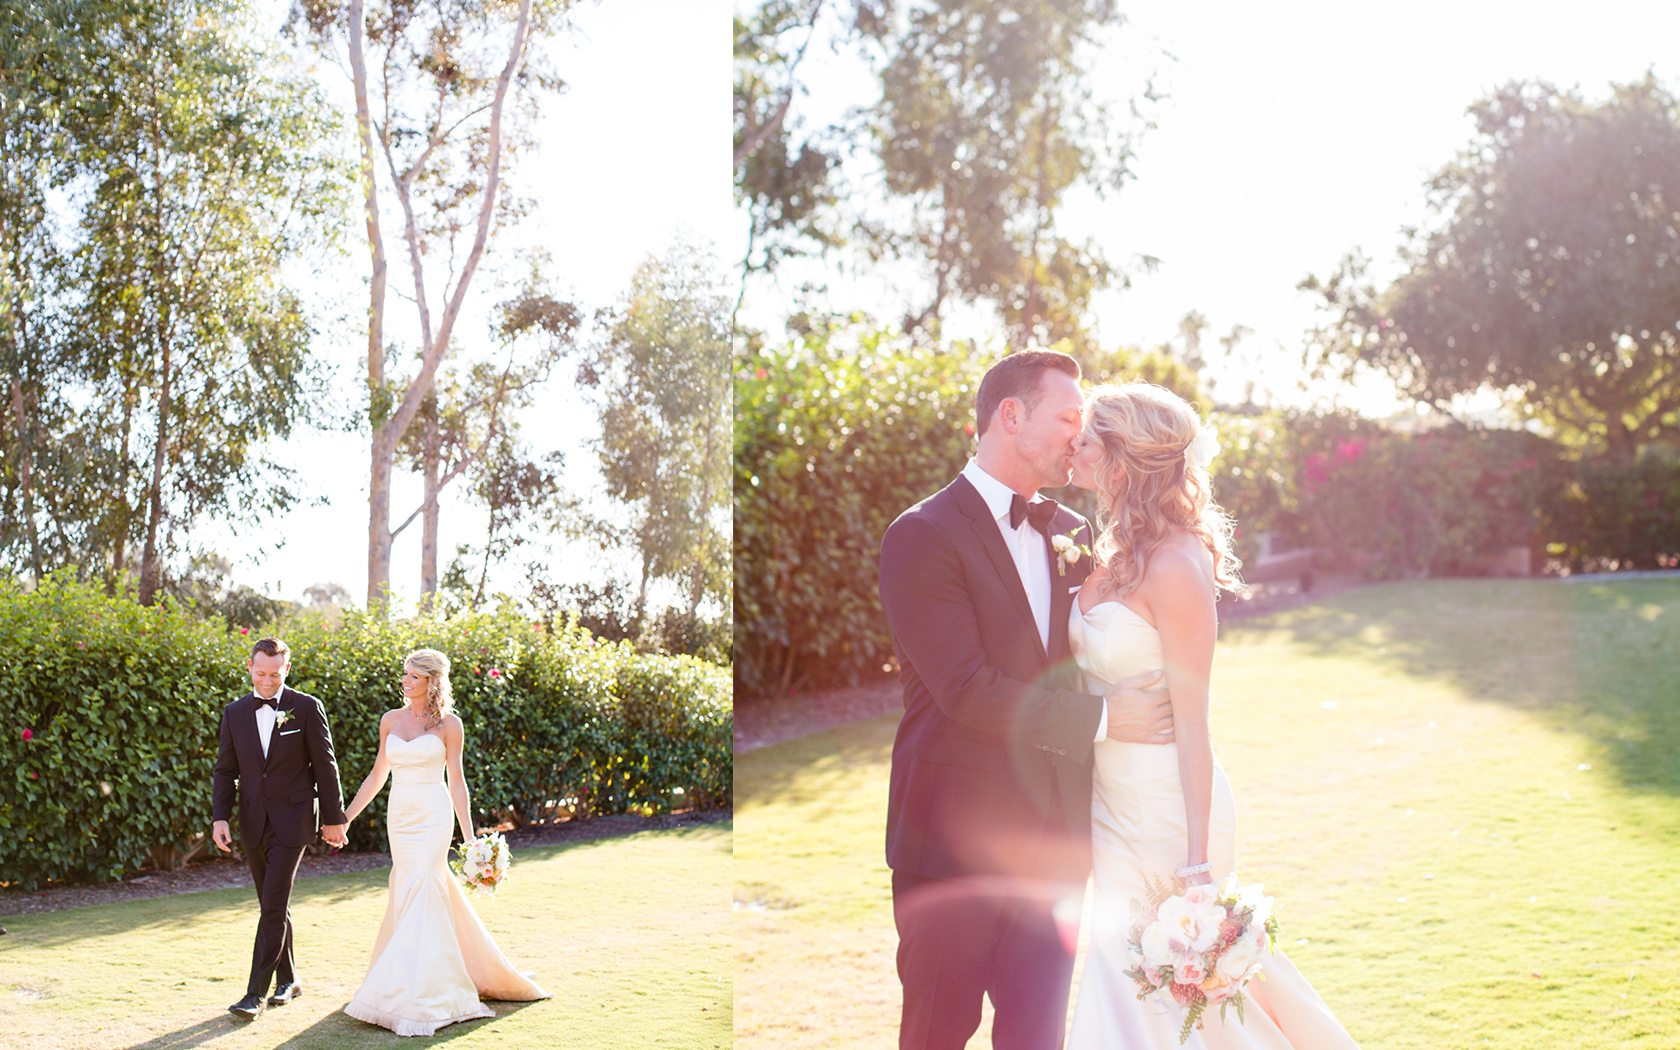 Rancho_Valencia_Resort_Wedding_043.jpg